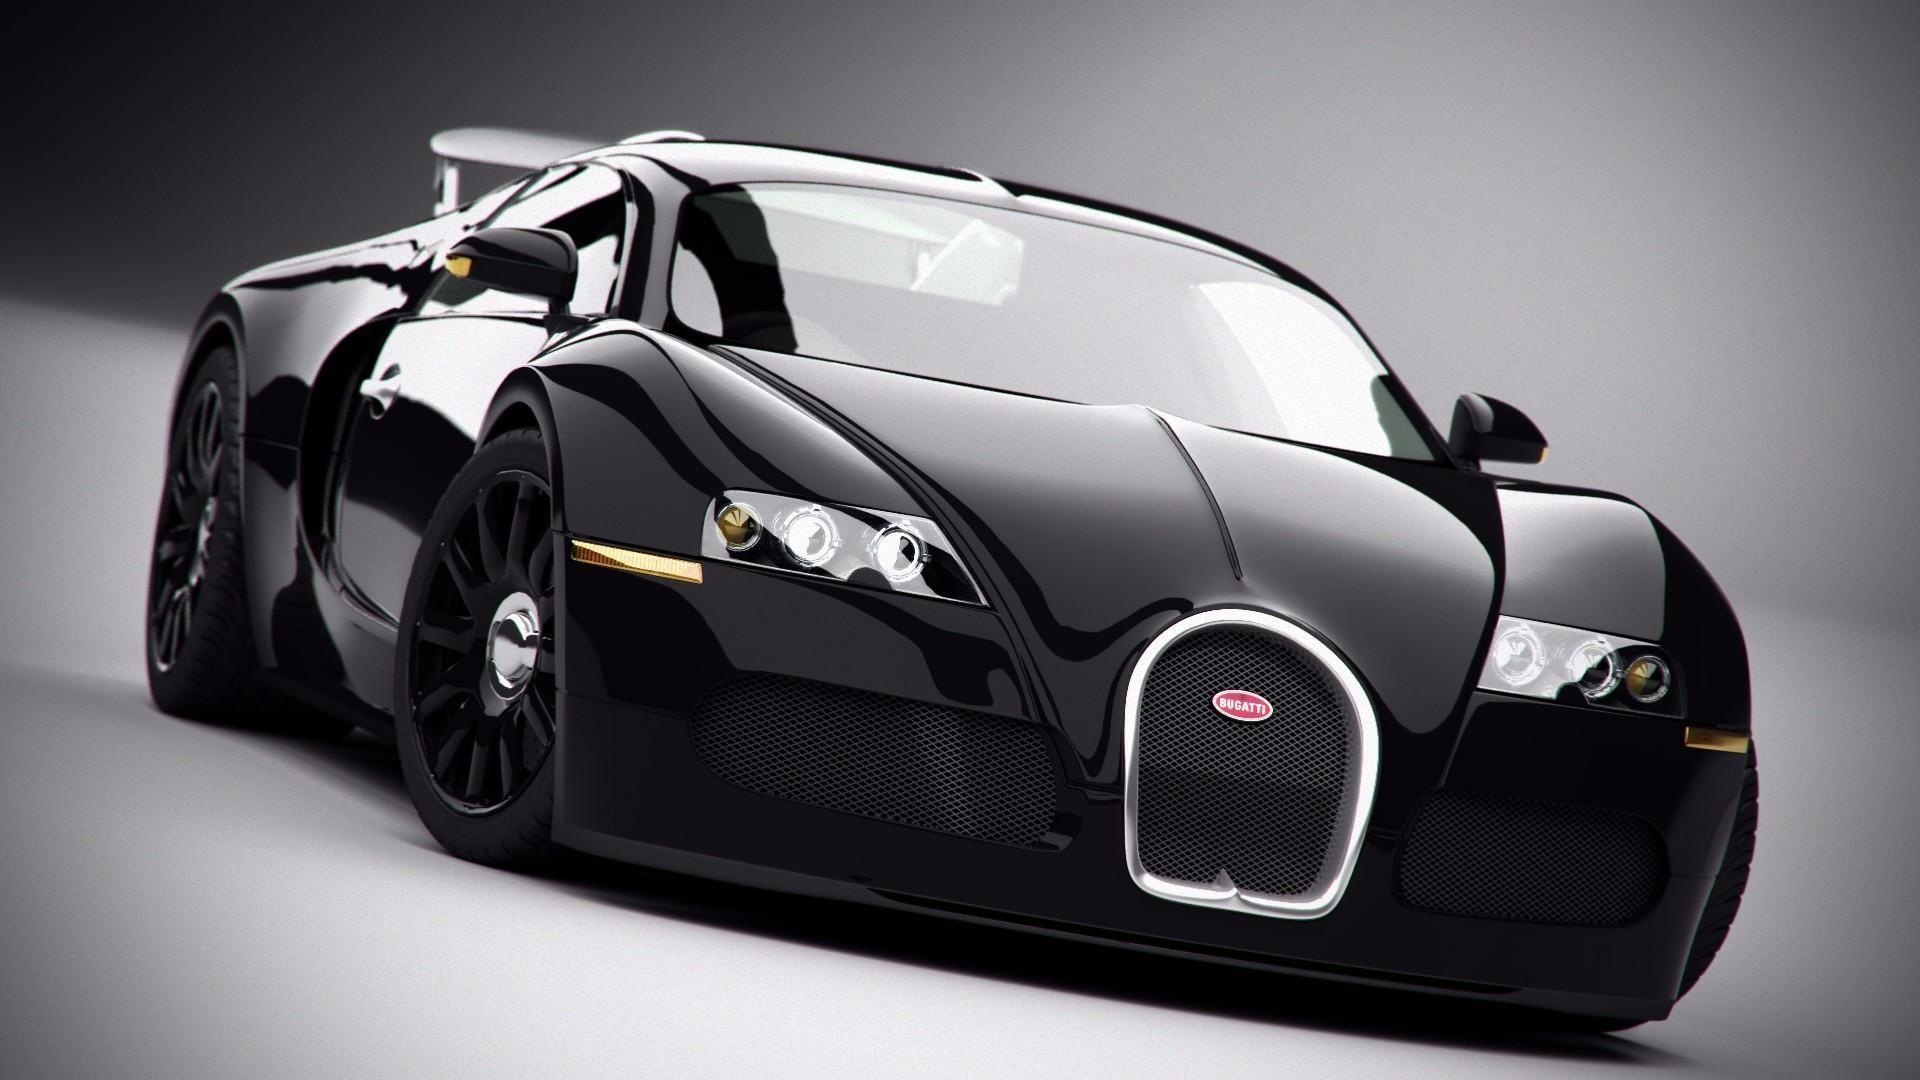 b1b4764ffe4096c870865a6661f429ff Stunning Bugatti Veyron Super Sport White Cars Trend